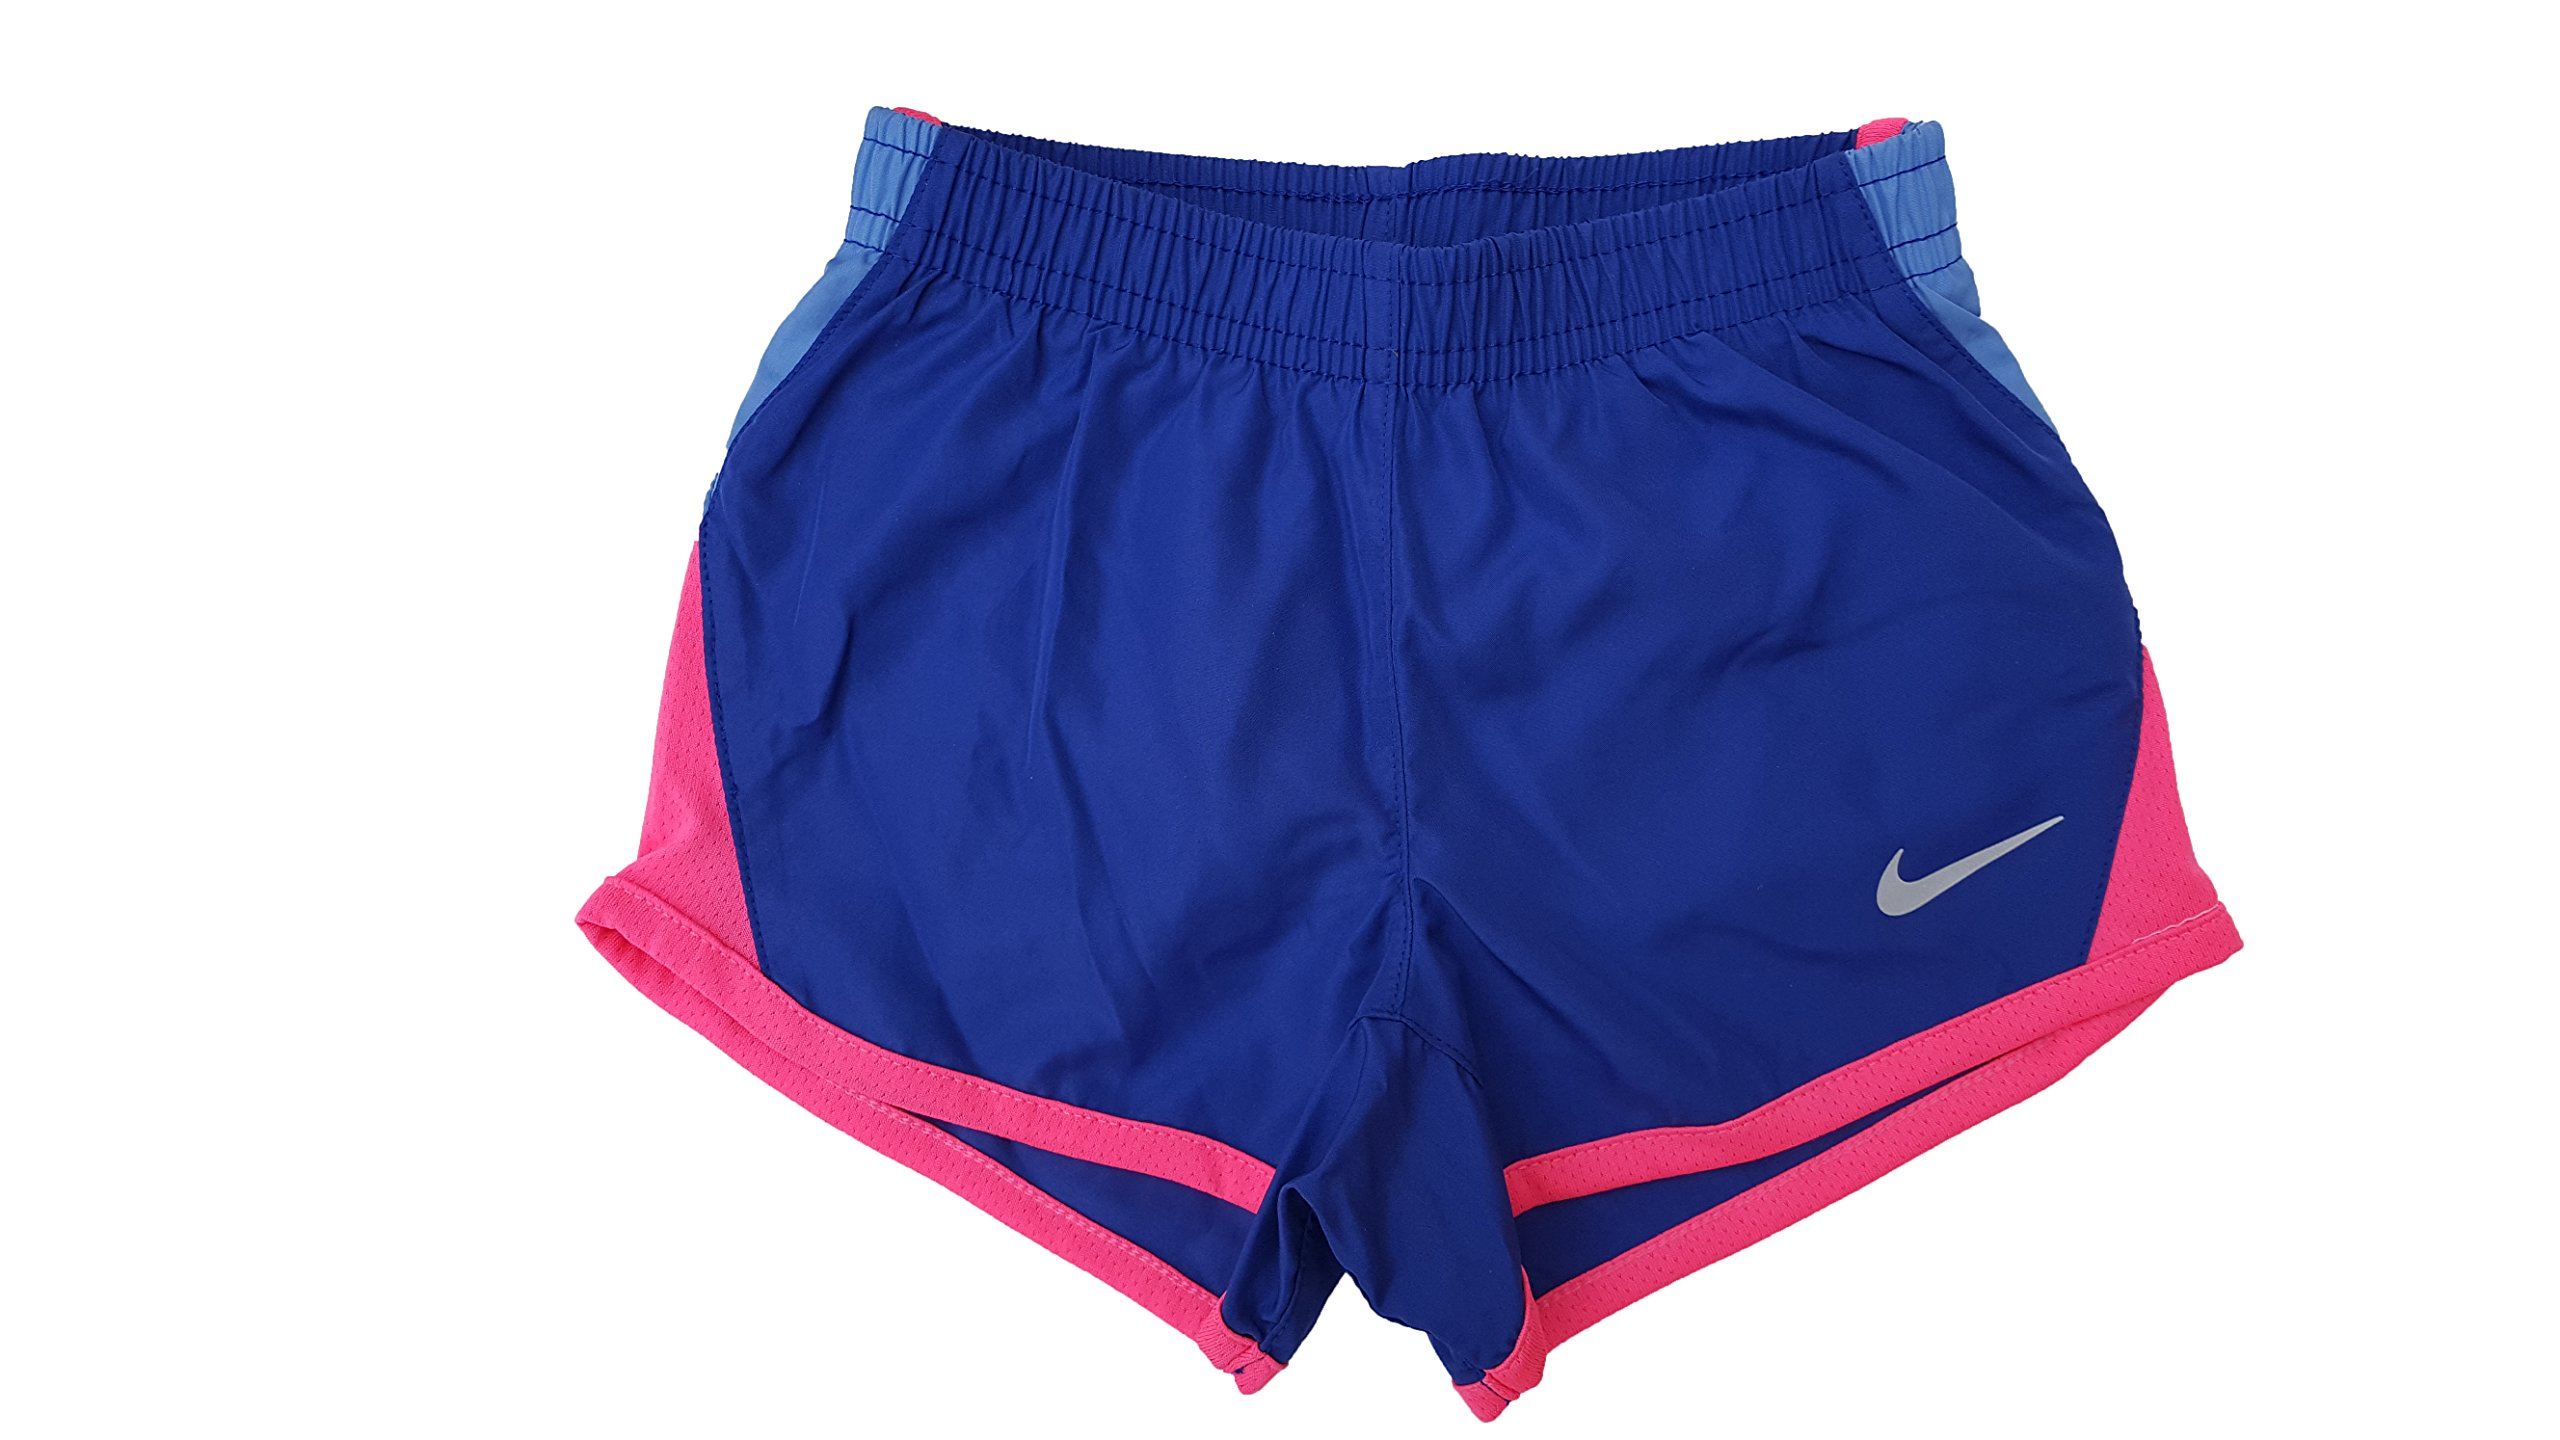 Nike Little Girls 10K Woven Colorblocked Running Shorts,Deep Night (603) / Pink/Reflective Silver,2T